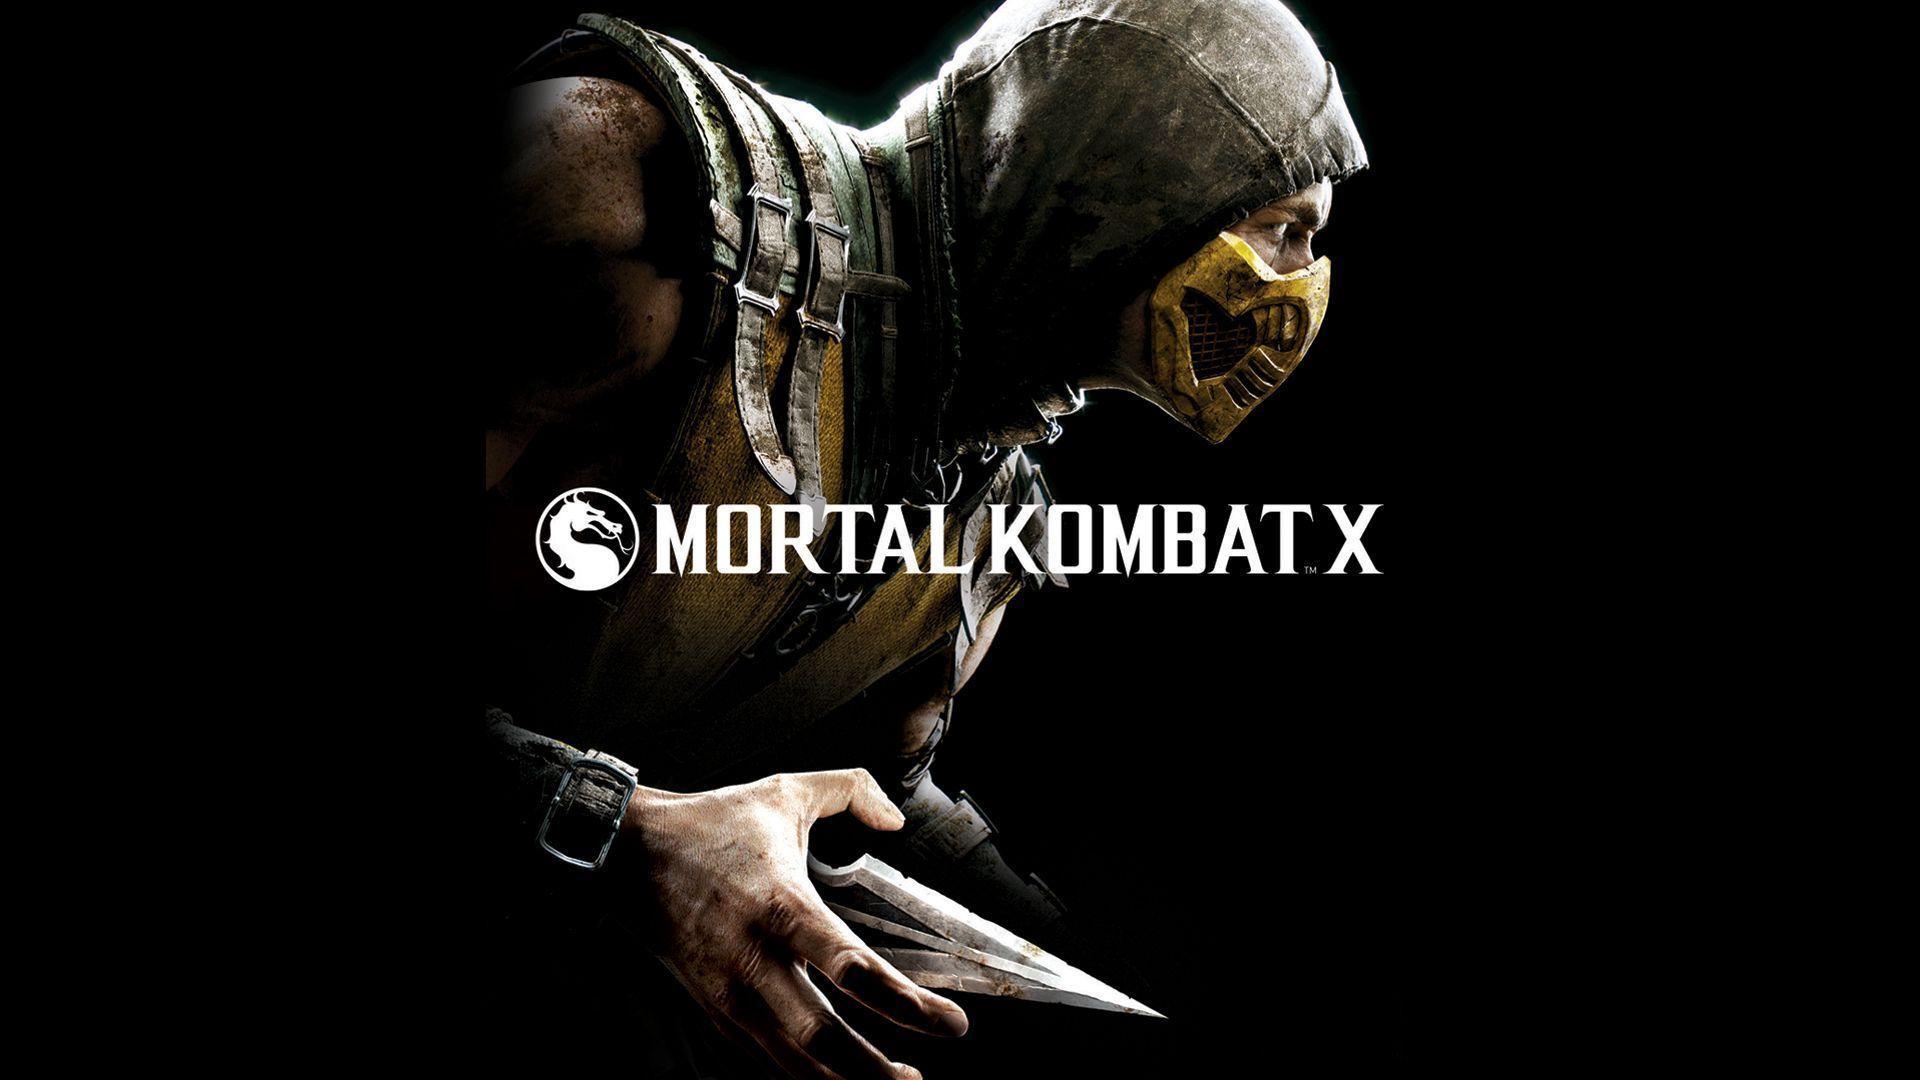 Mortal Kombat X Scorpion Wallpapers Top Free Mortal Kombat X